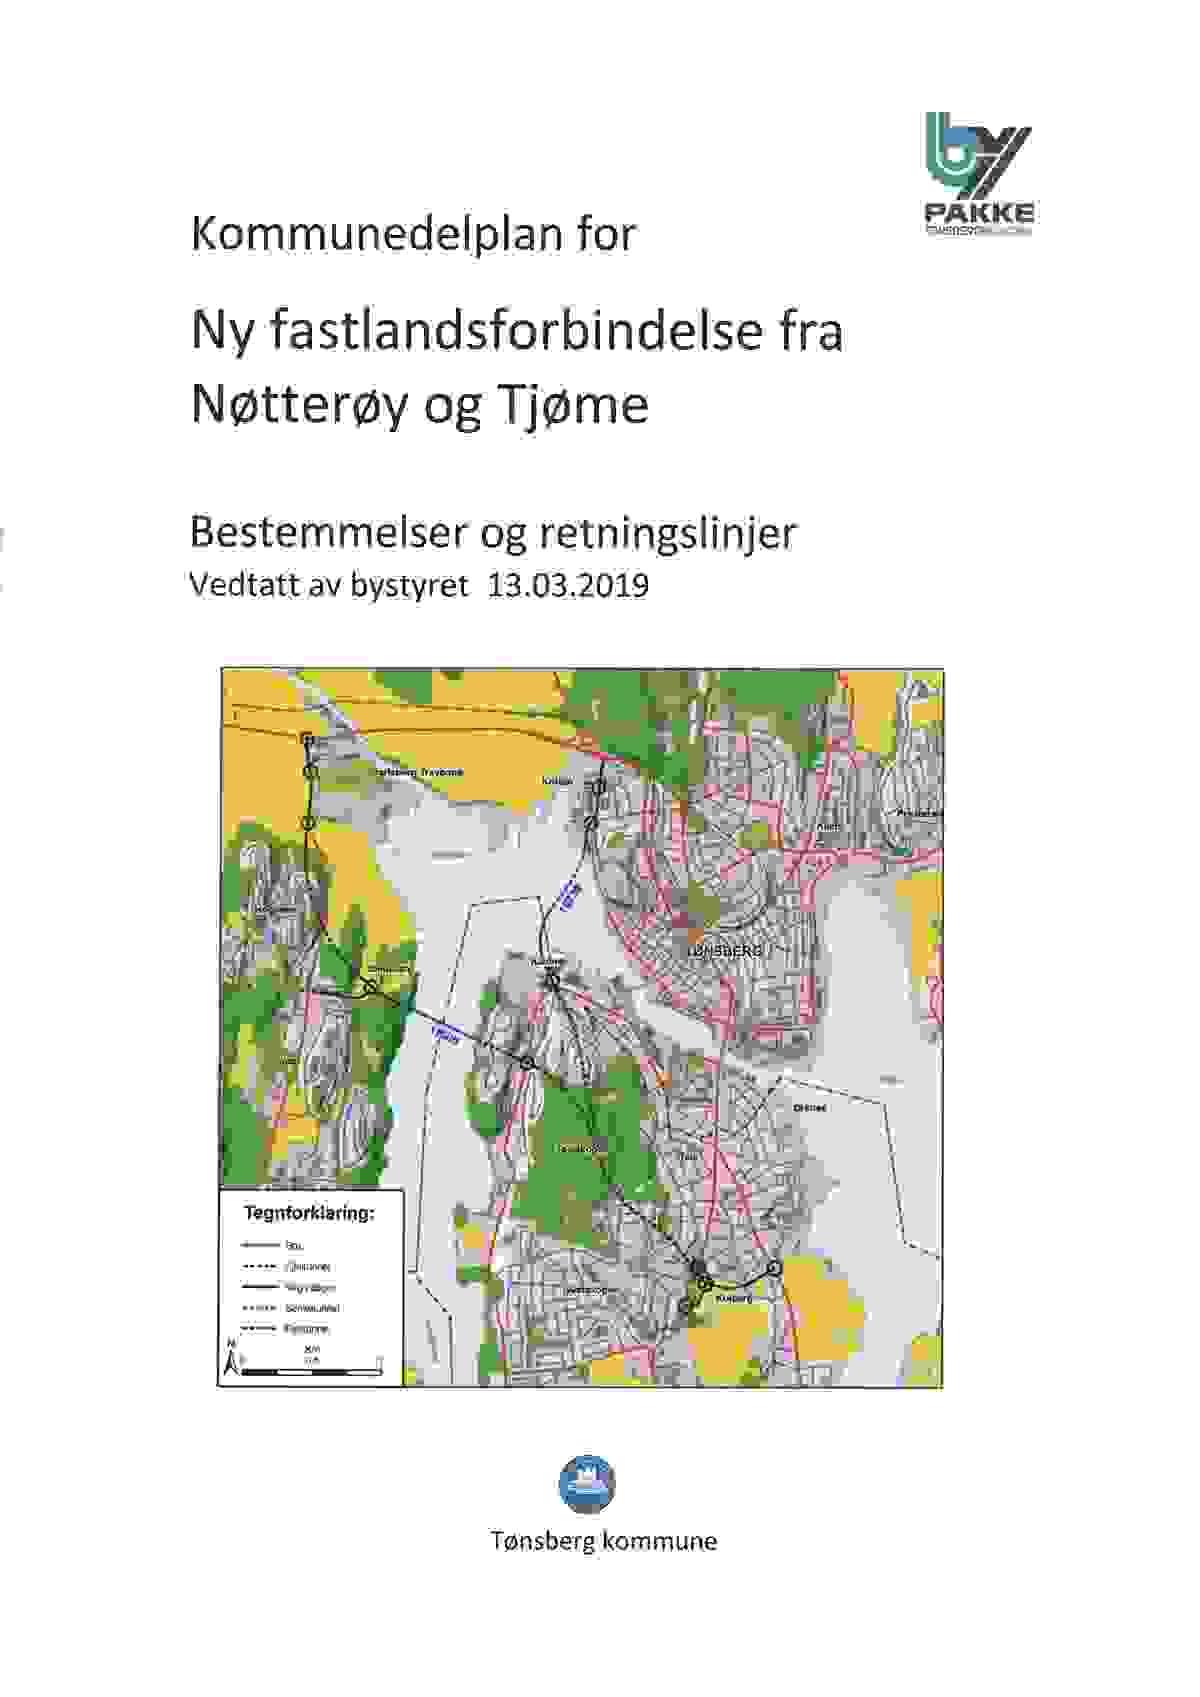 Ny fastlandsforbindelse vedtatt 13.03.2019 - konferer megler vedrørende ny fastlandsforbindelse som vil medføre at Hogsnesbakken ikke lenger vil være hovedfartsåre